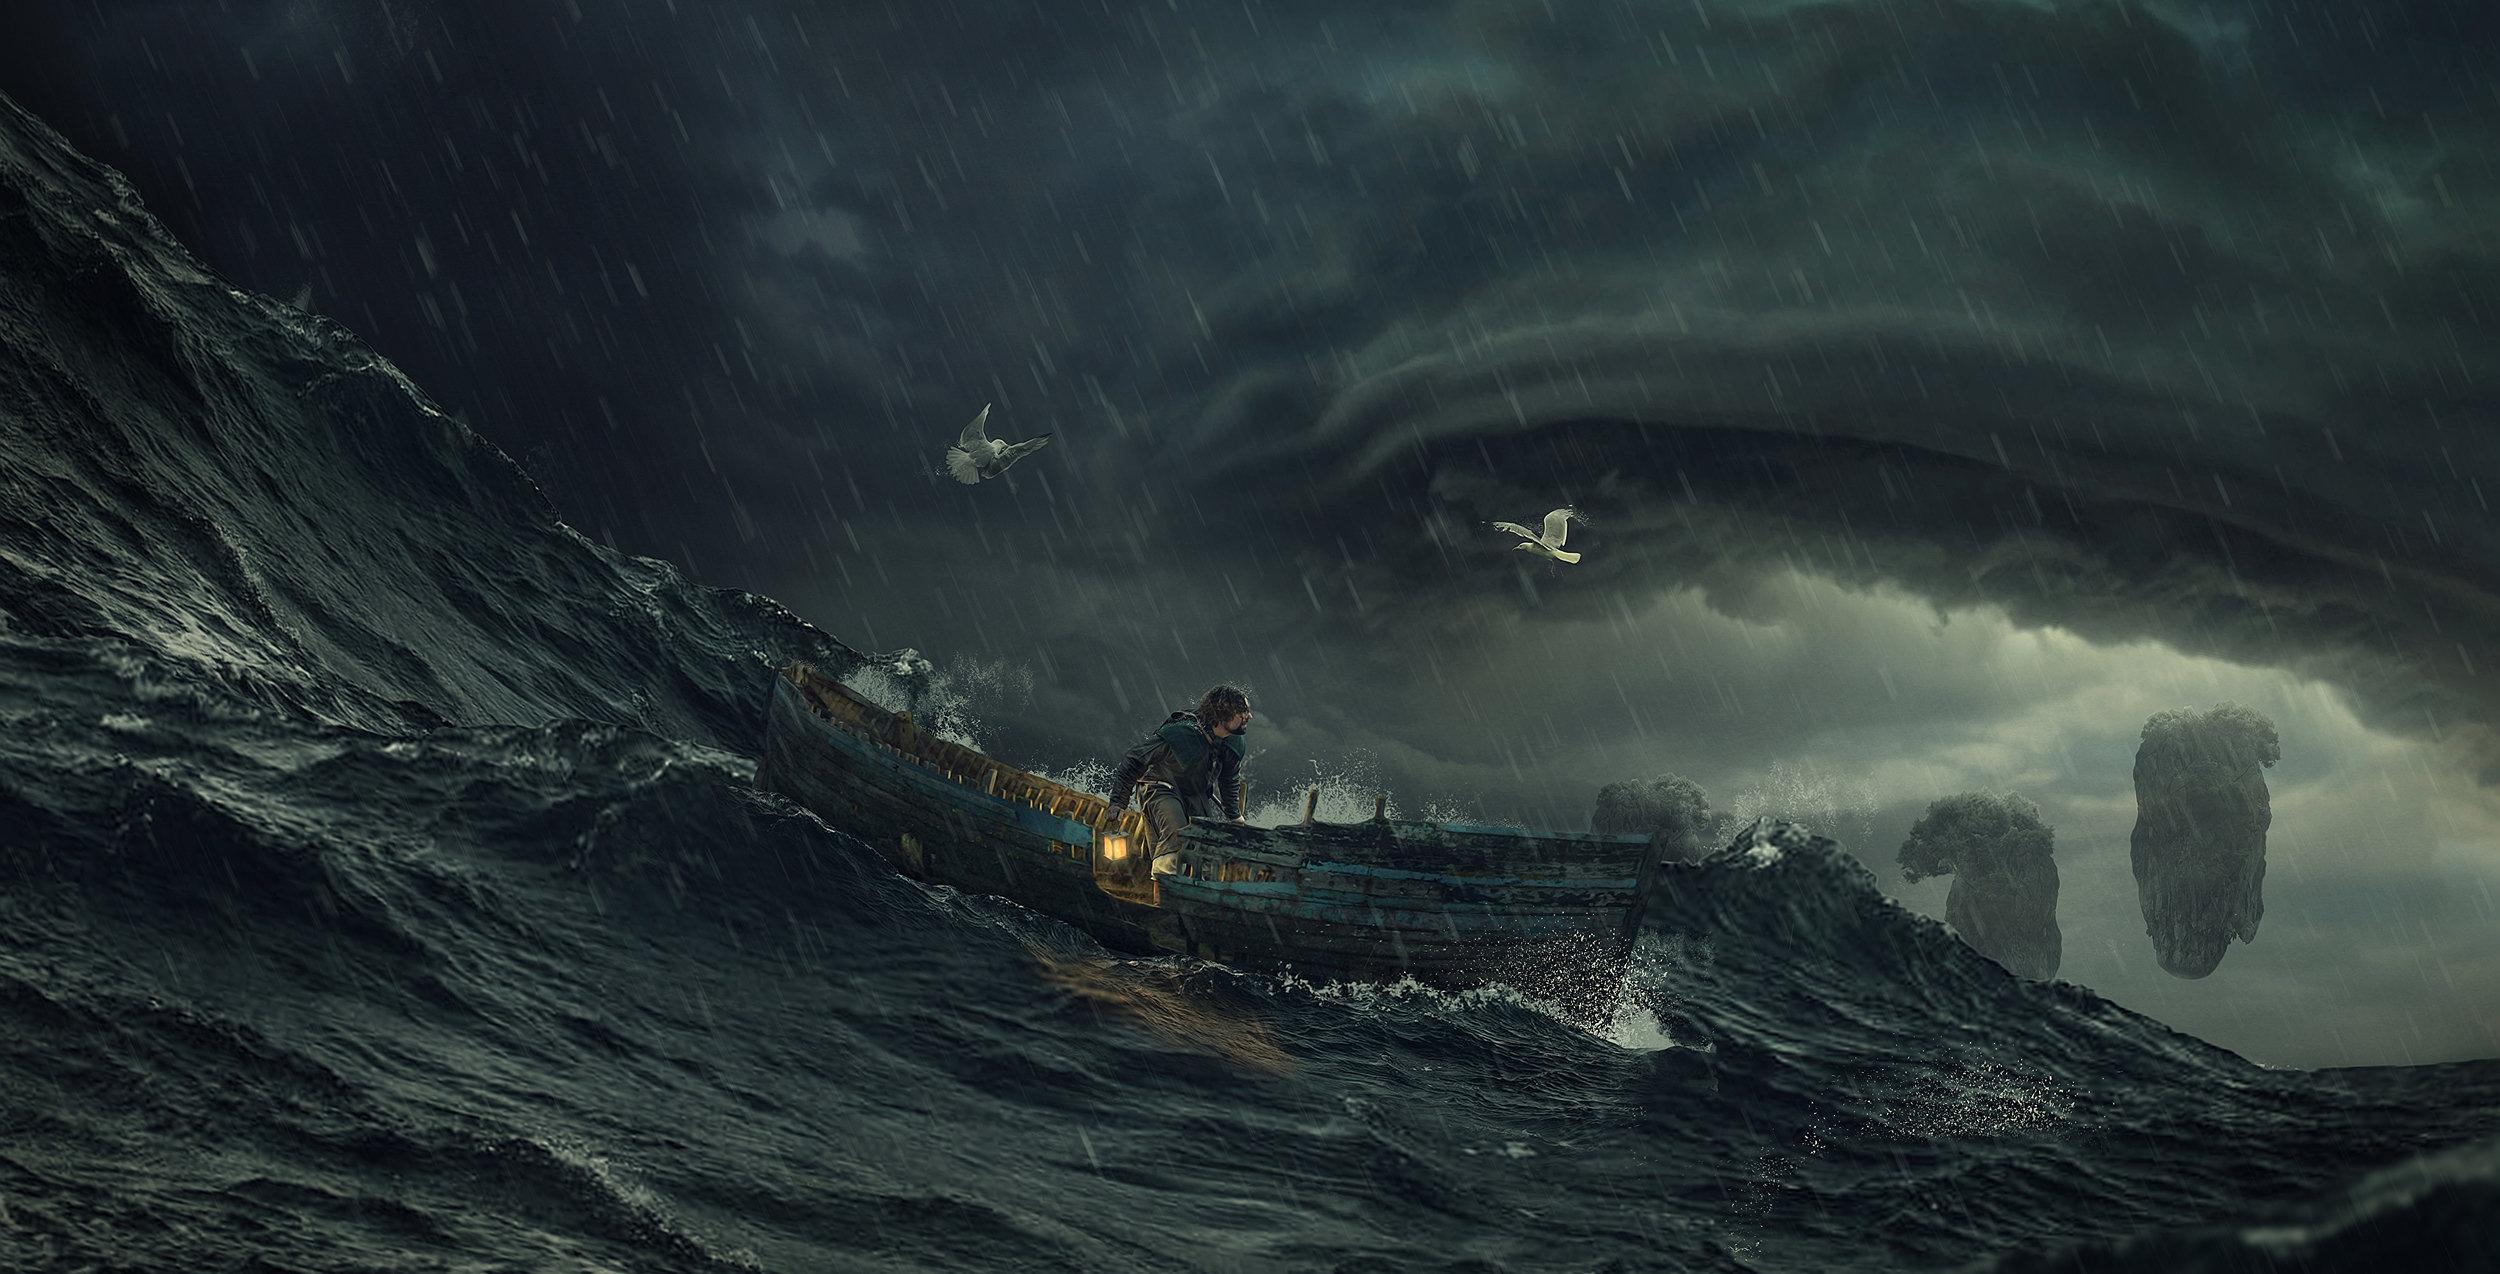 storm-4718x2405-hd-4k-8992.jpg